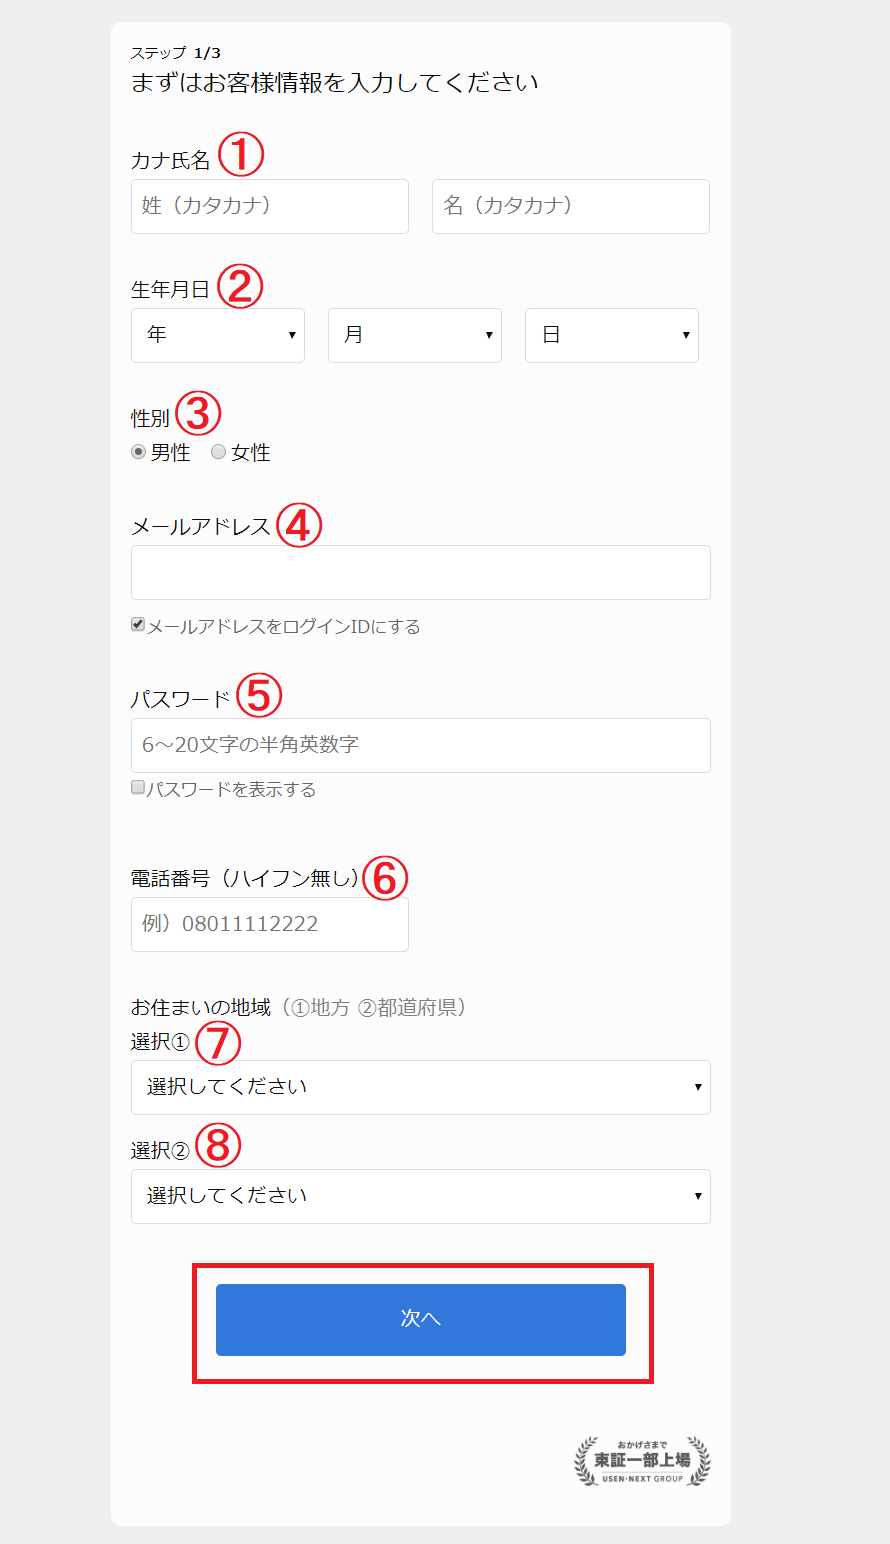 U-NEXT_入会登録ステップ1_お客様情報入力